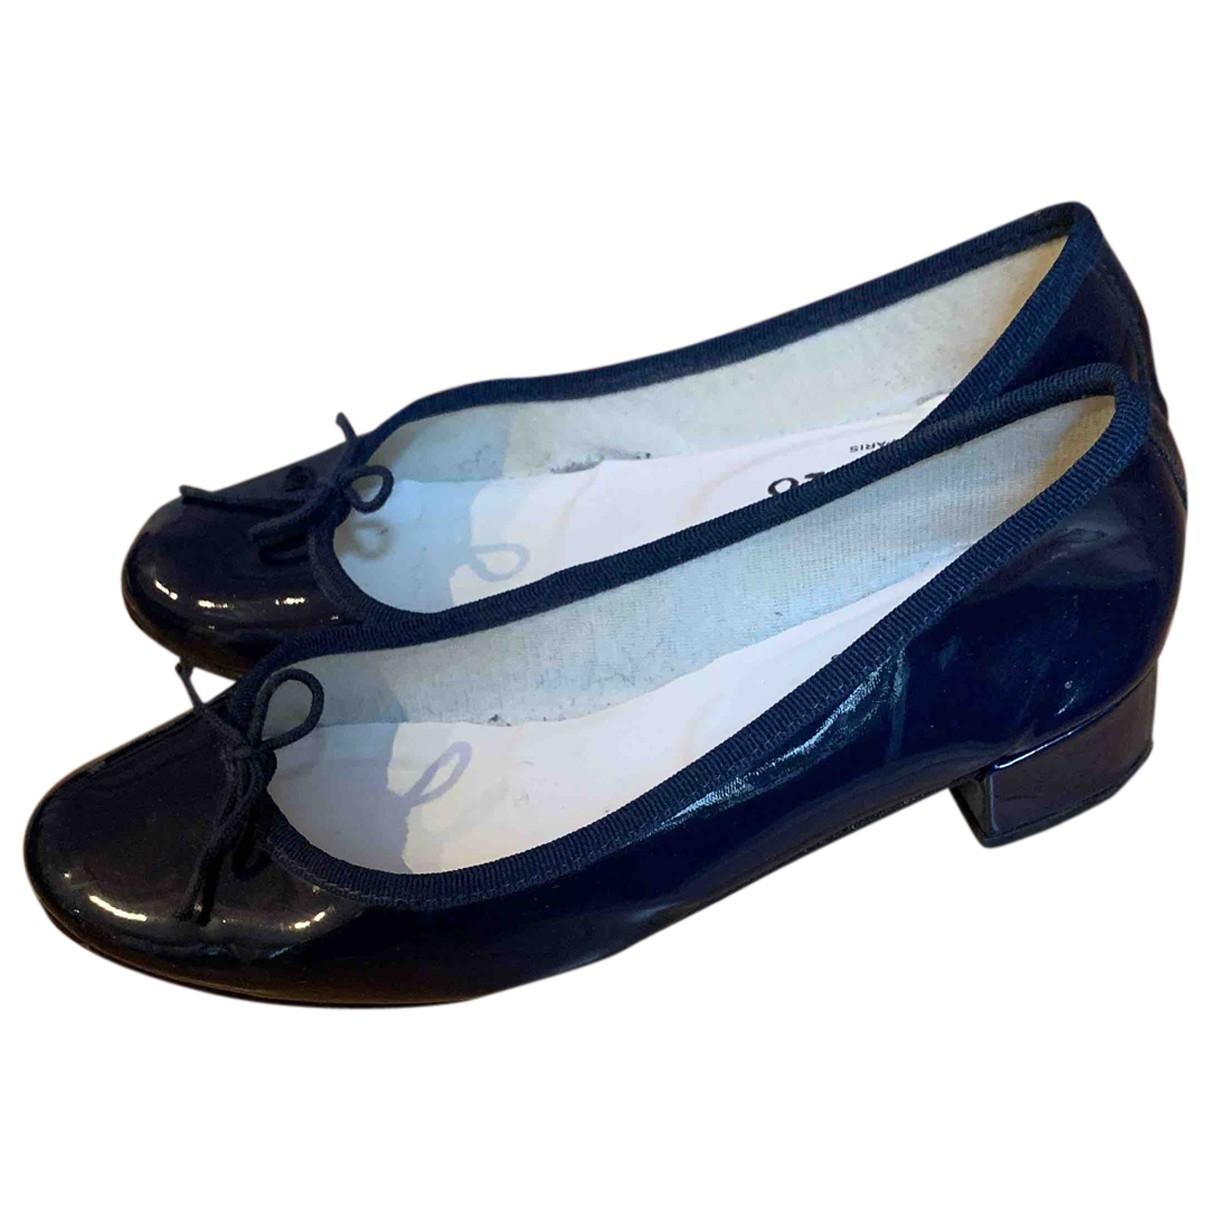 Repetto \N Ballerinas in  Blau Lackleder